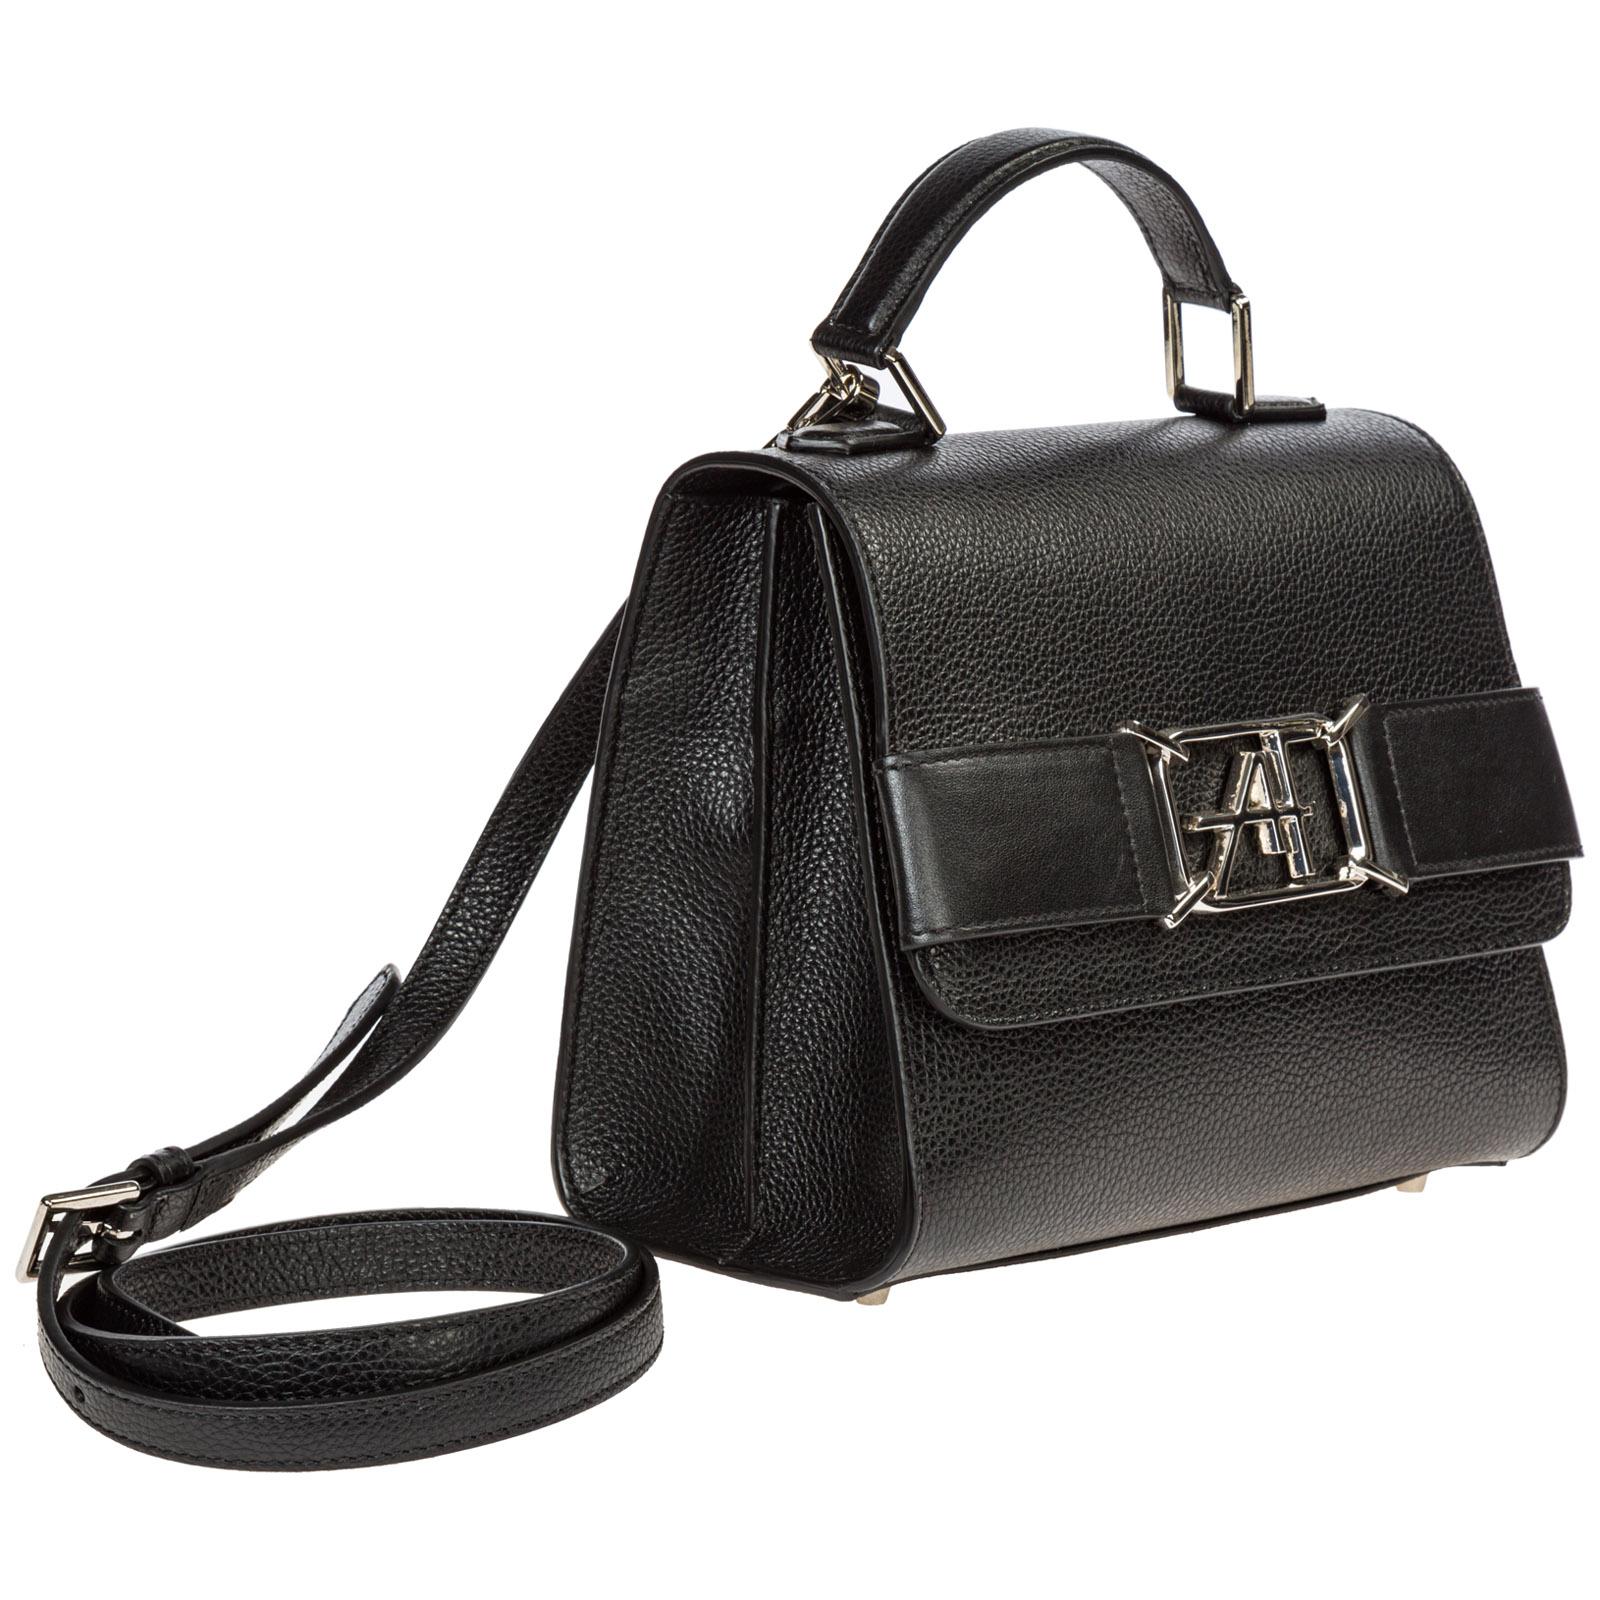 Women's leather handbag shopping bag purse